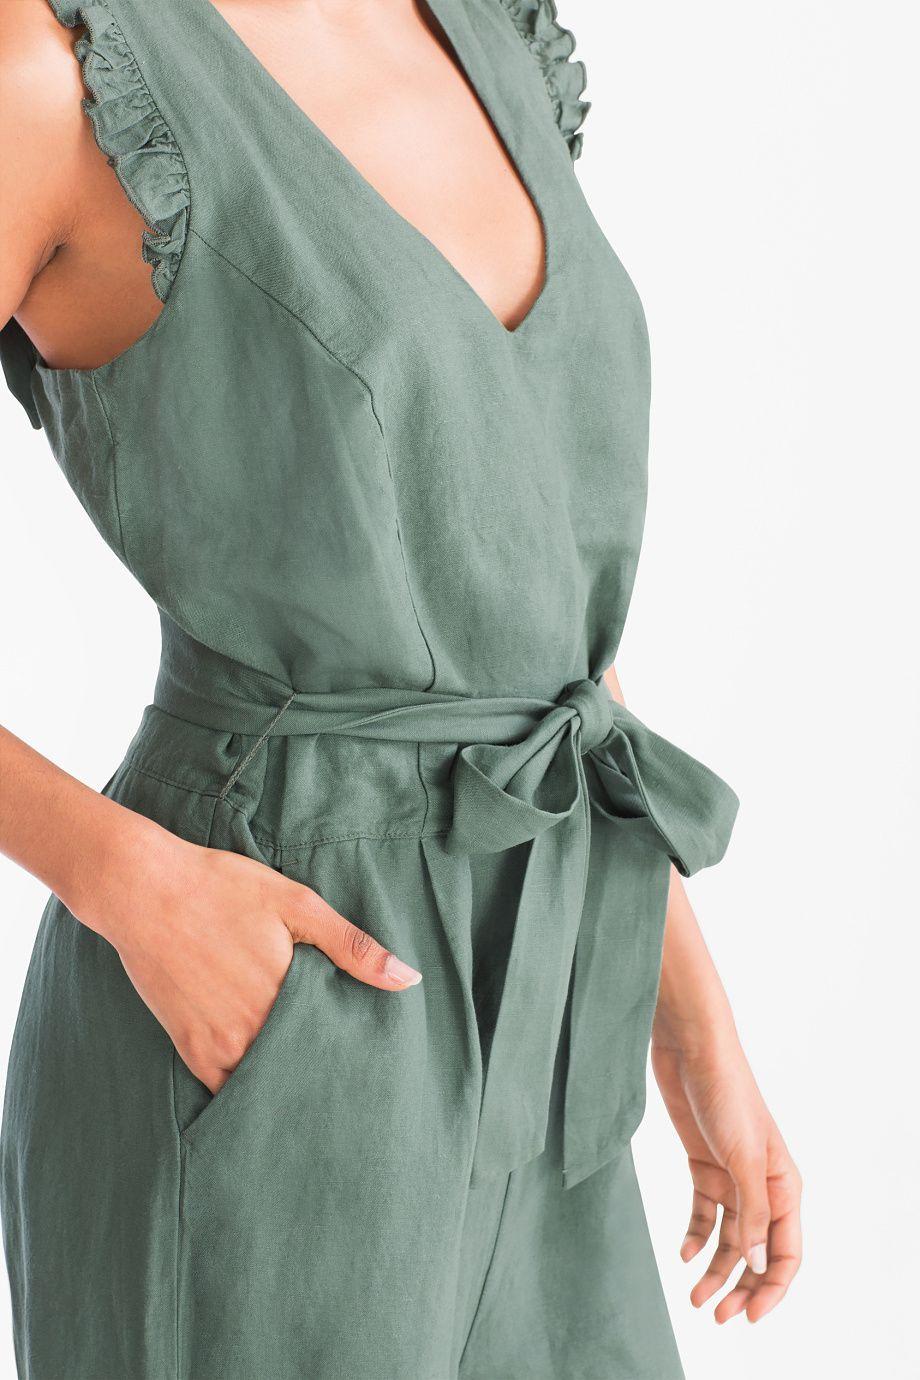 Black Friday Jumpsuit Linen Blend Dark Green Jumpsuitfashion Macacao Para Mulheres Listras Da Moda Roupas